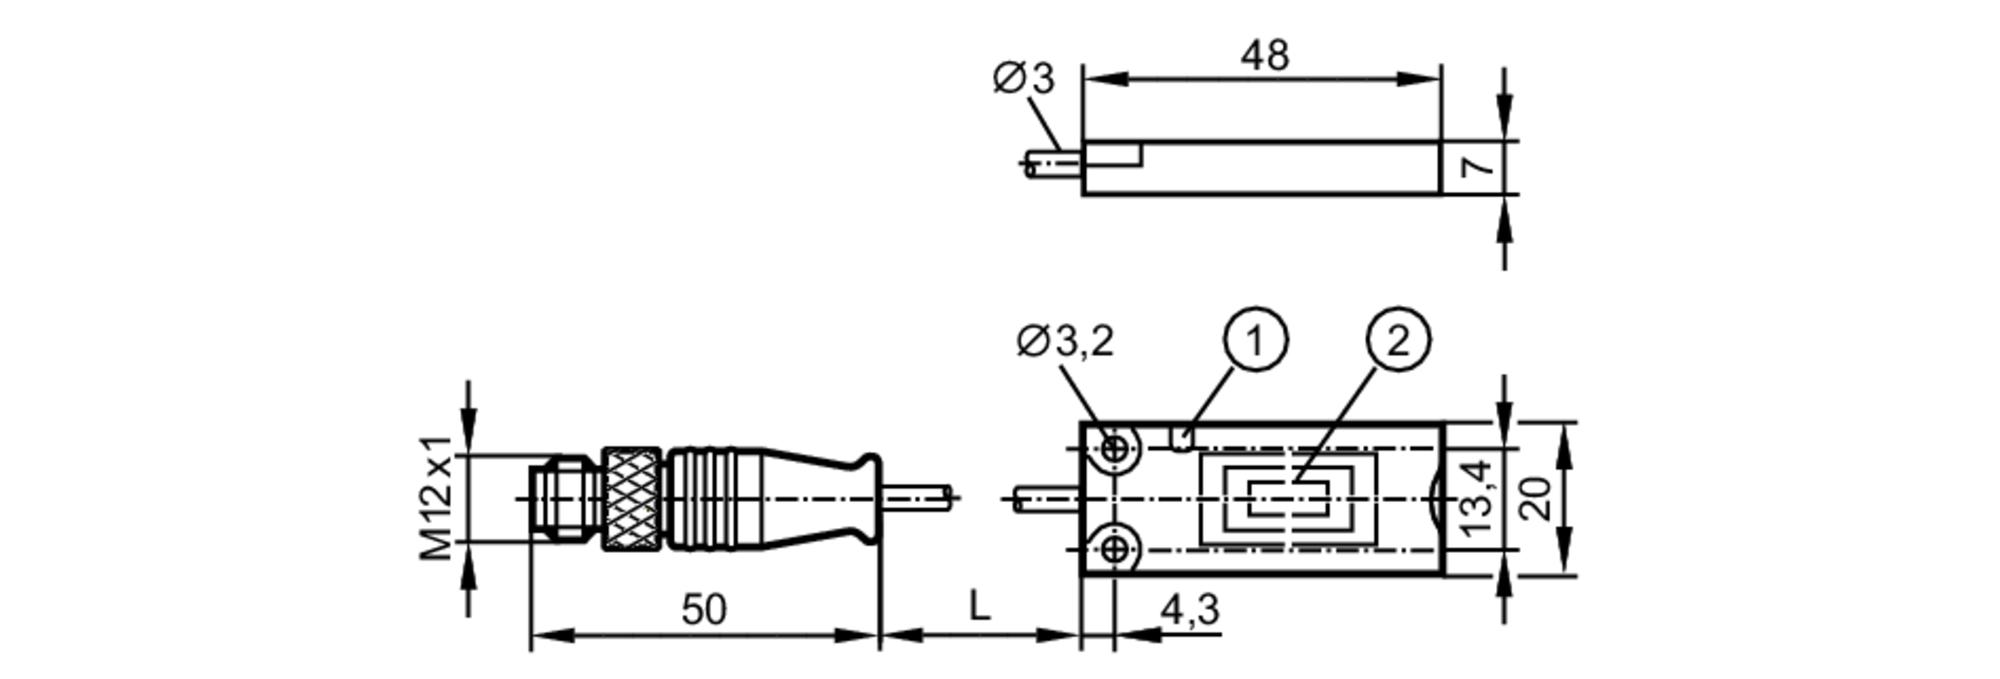 Dti515 Rfid Read Write Head Hf Ifm Electronic